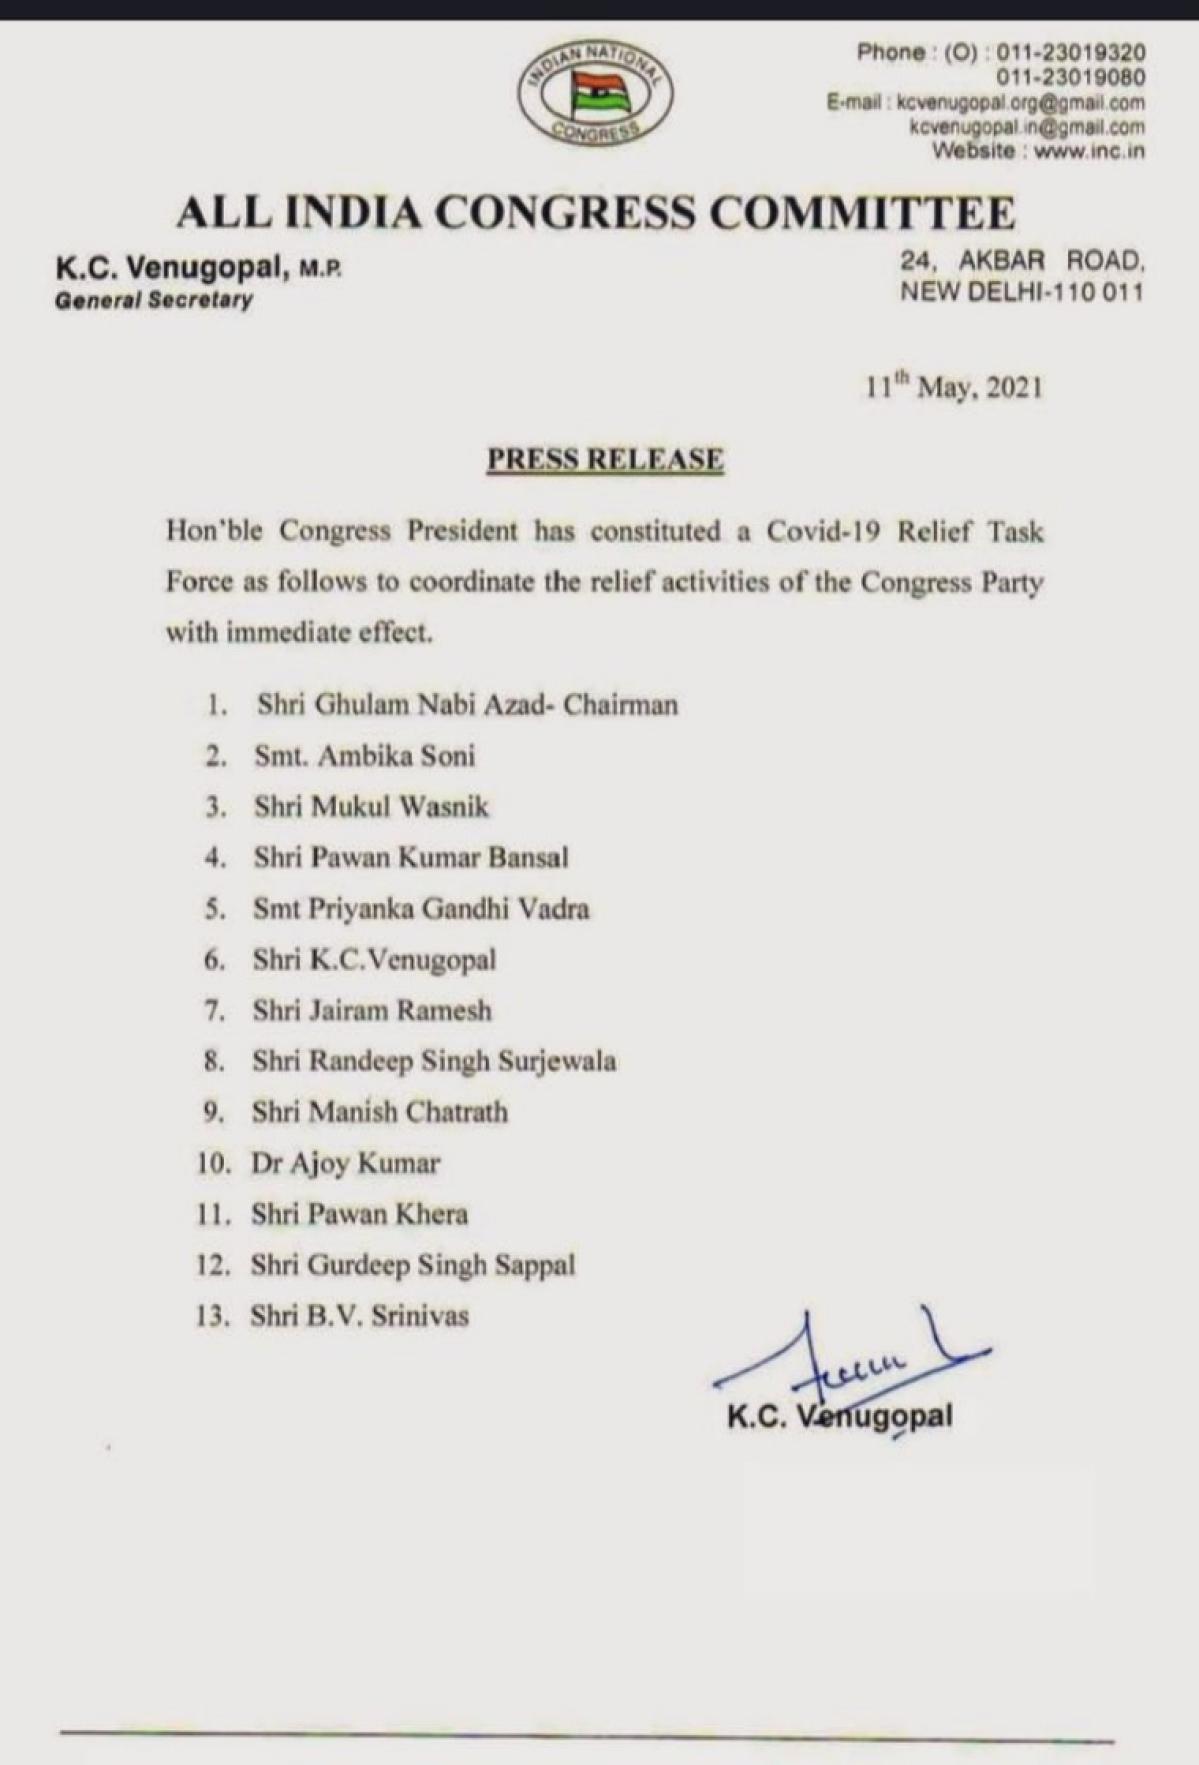 Ghulam Nabi Azad to head Congress task force on COVID-19